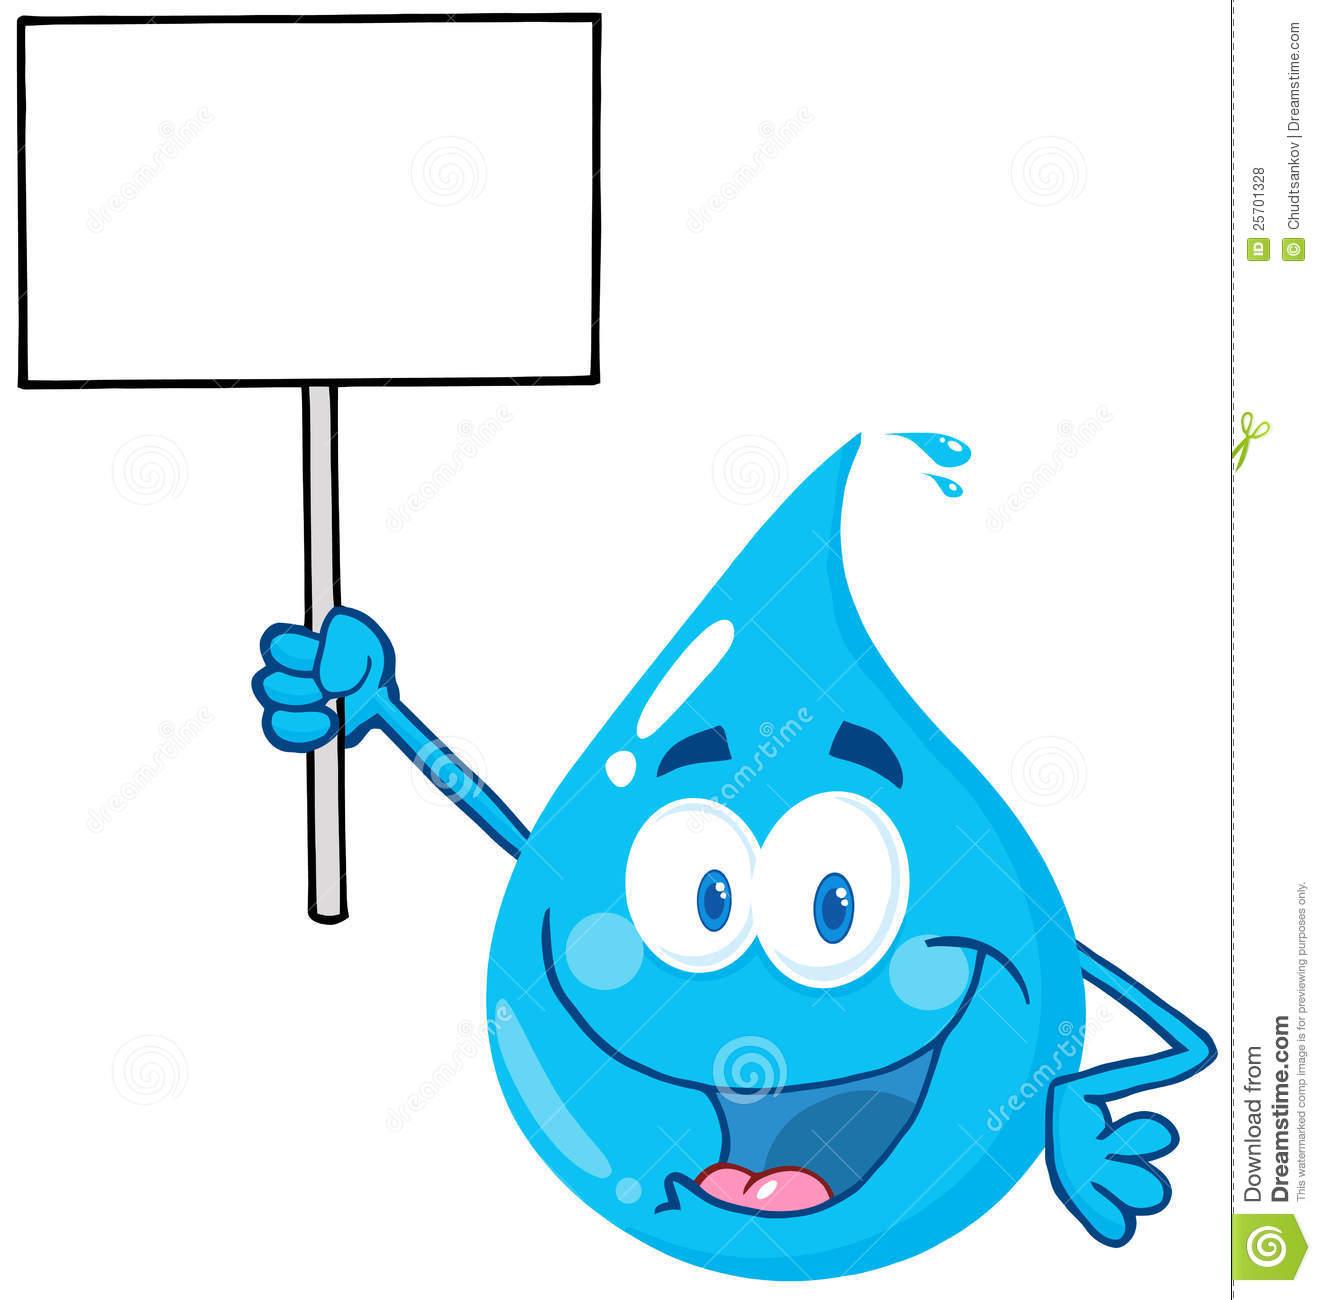 Water Drop Splash Clipart | Clipart Panda - Free Clipart ...